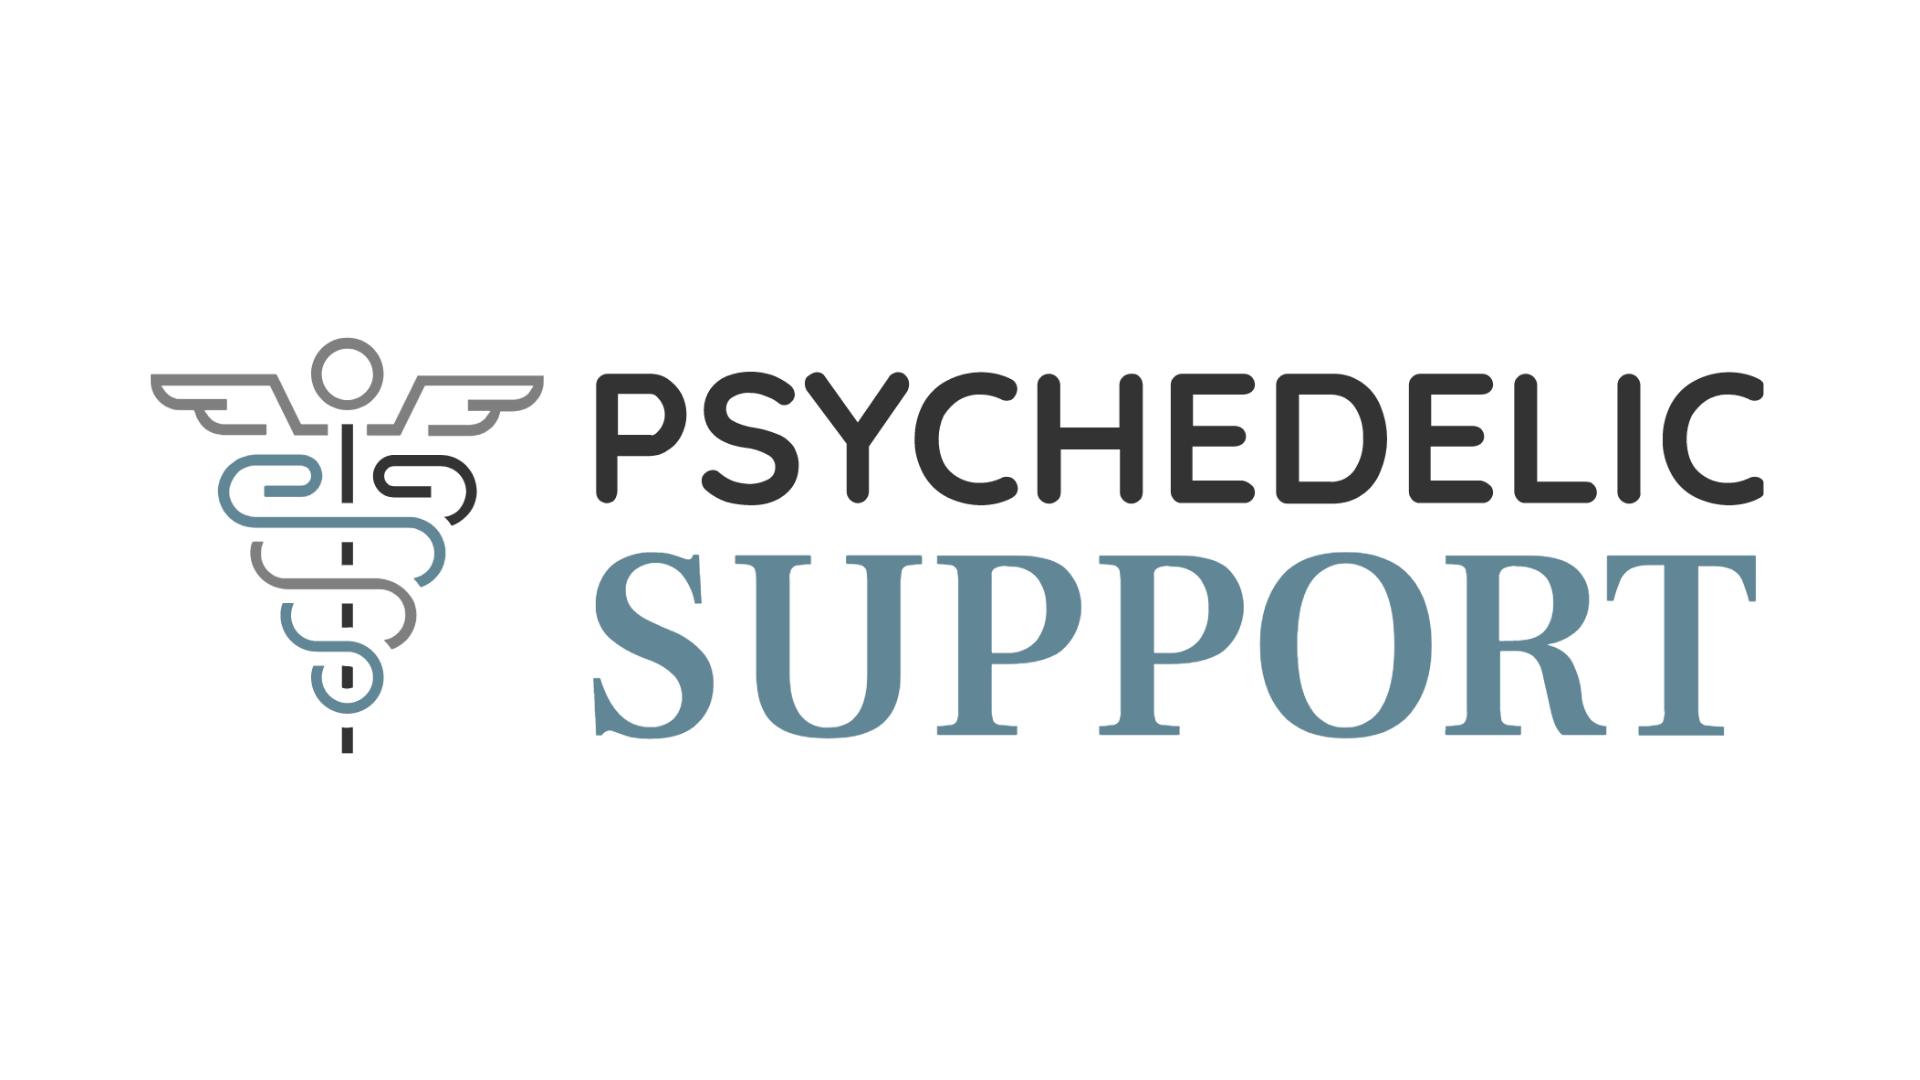 Psychedelic Support - v2.png